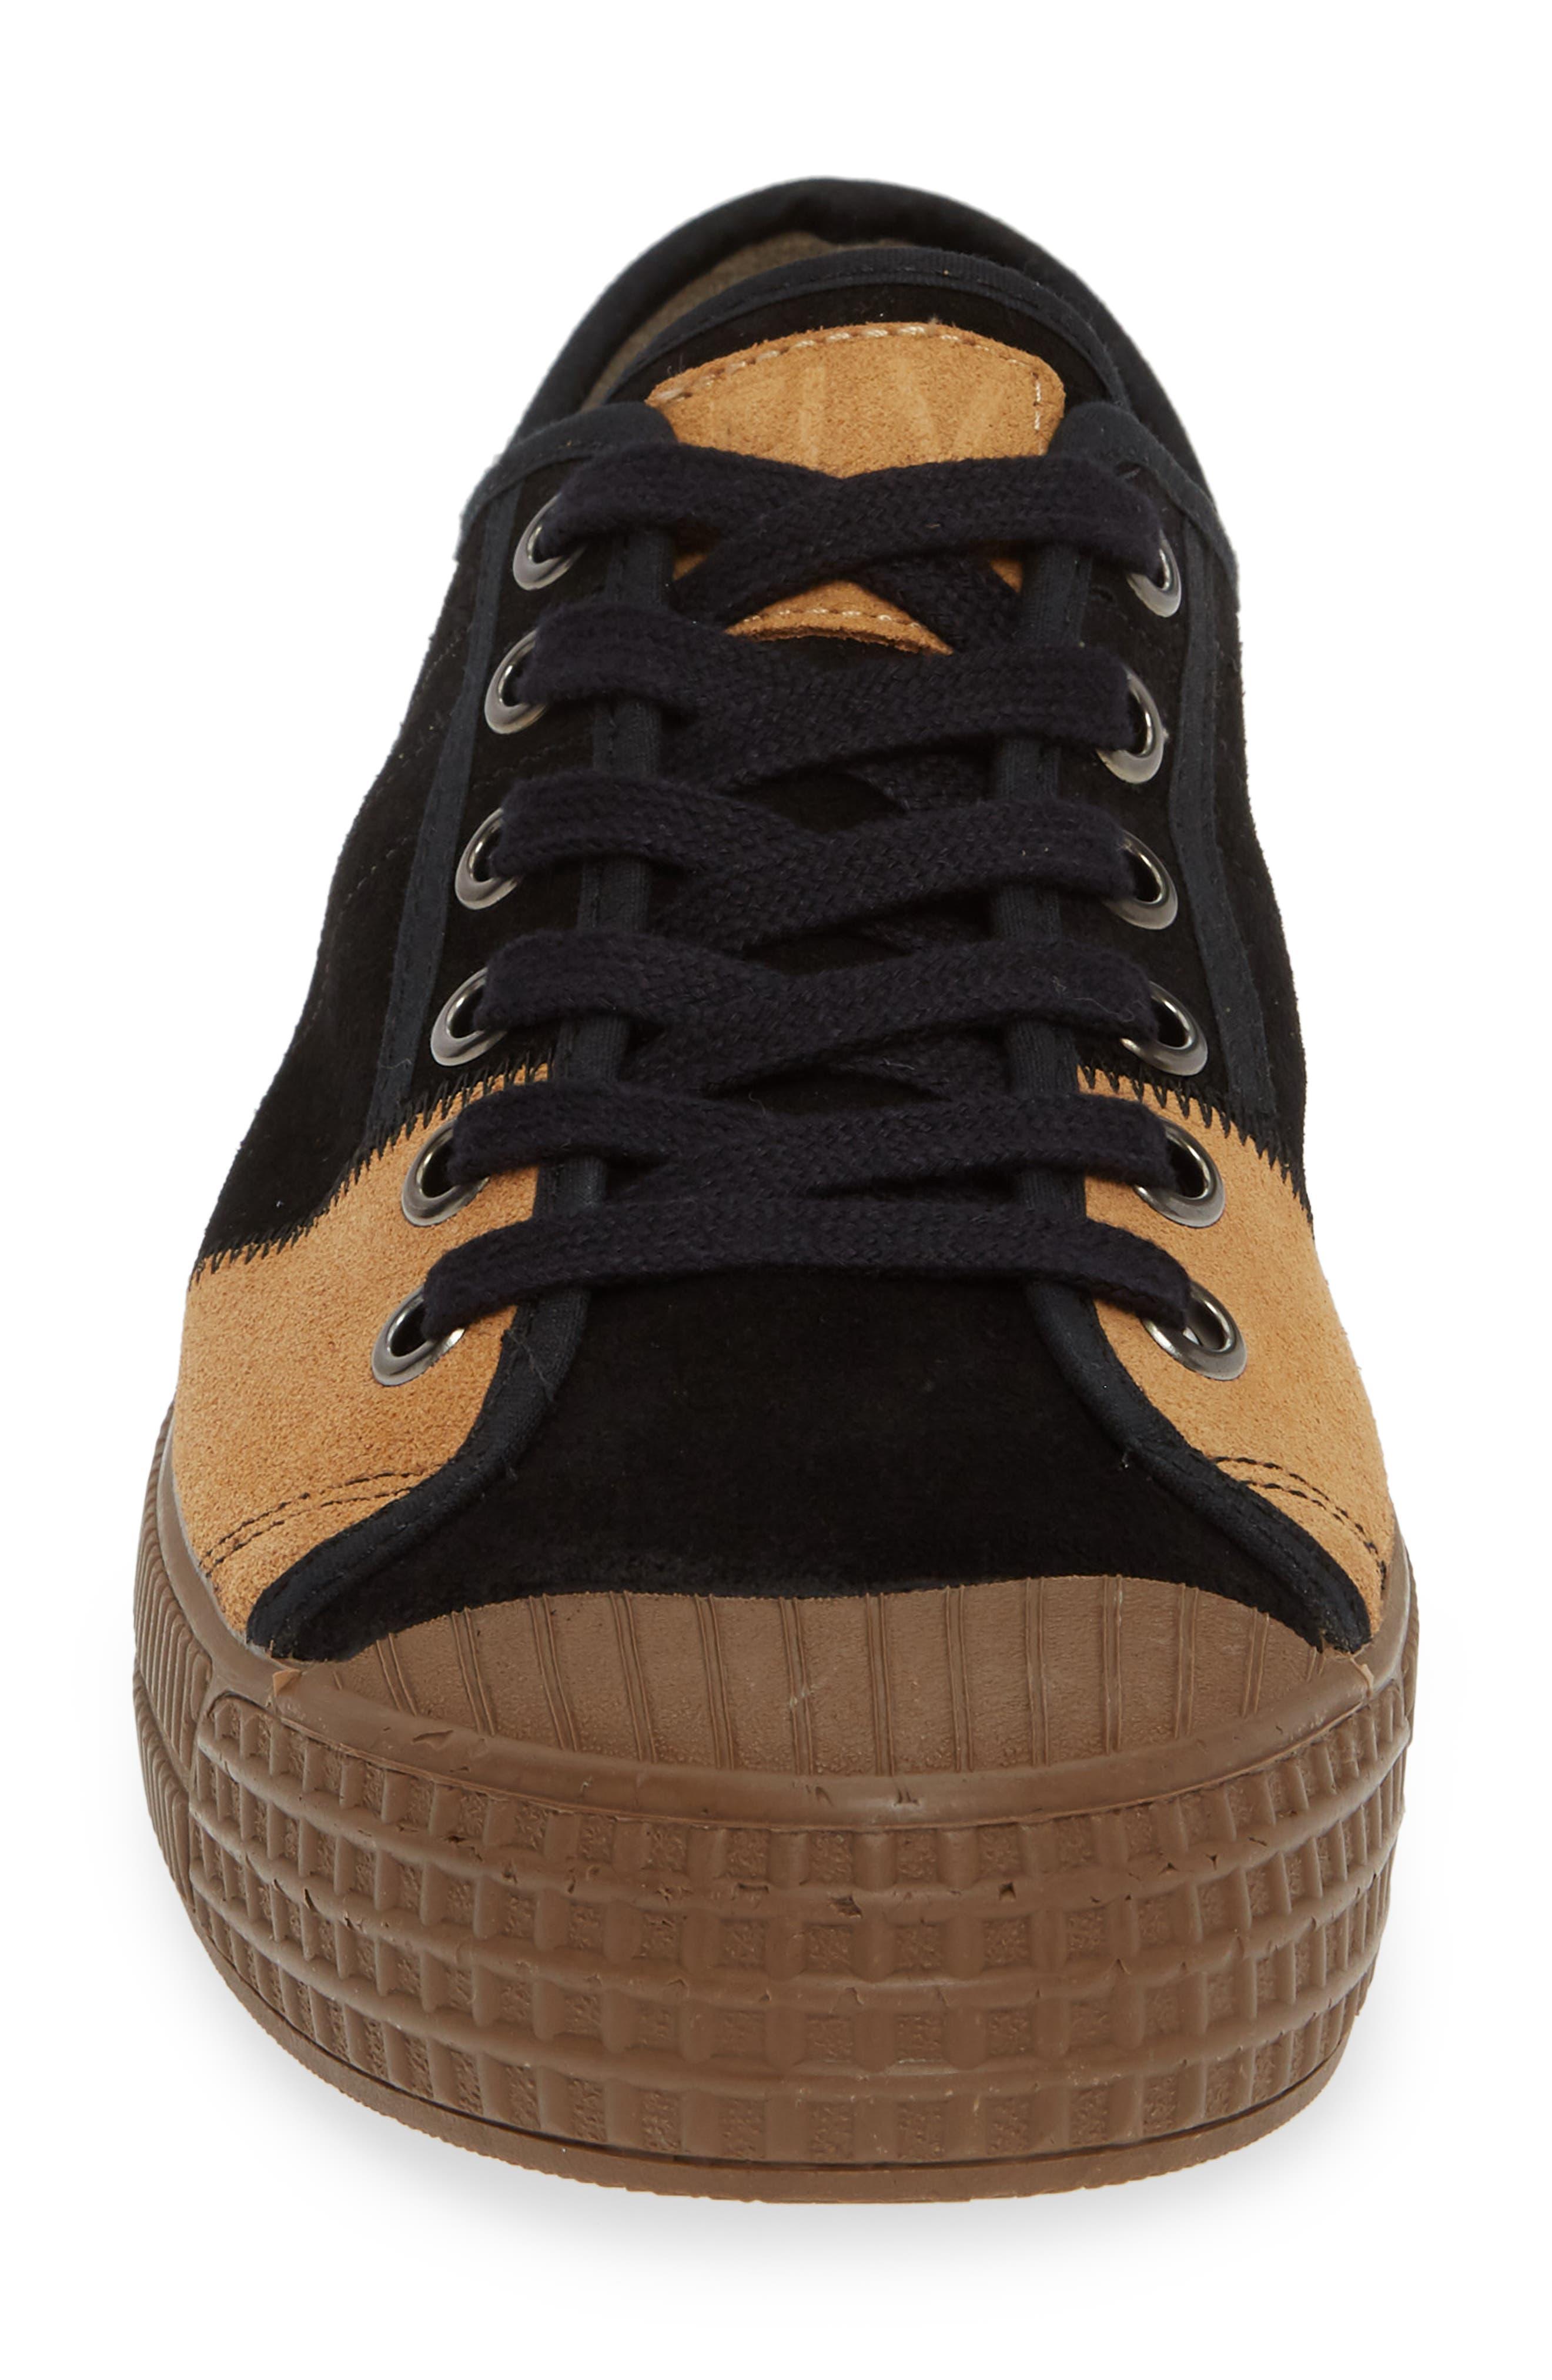 Foto Sneaker,                             Alternate thumbnail 4, color,                             BLACK/ CAMEL SUEDE